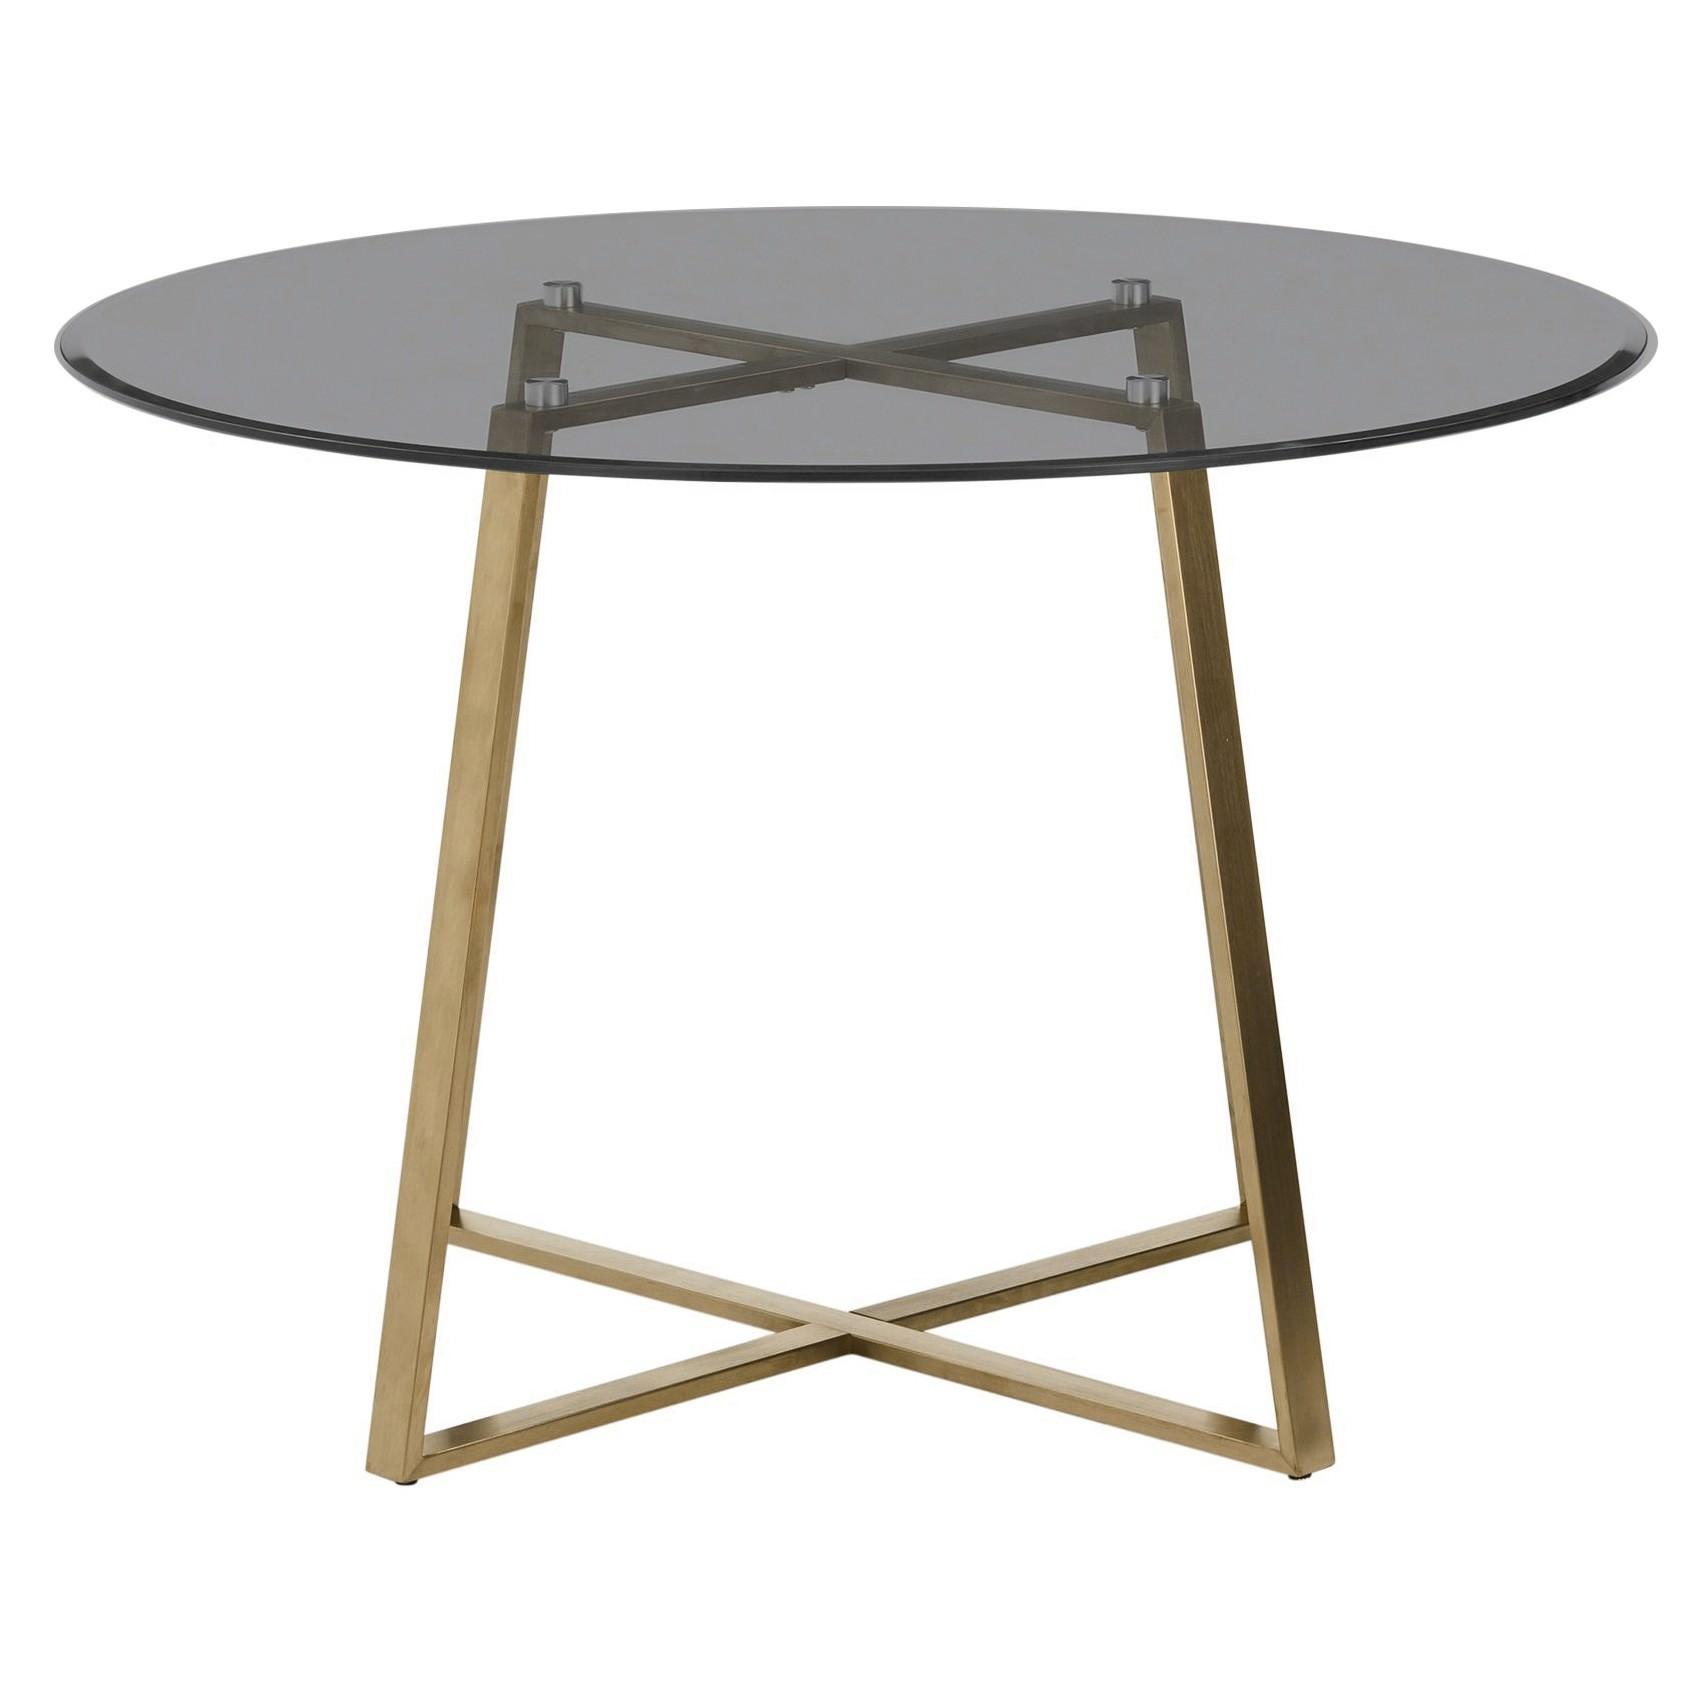 Akira Round Dining Table, 120cm, Smokey Grey / Gold